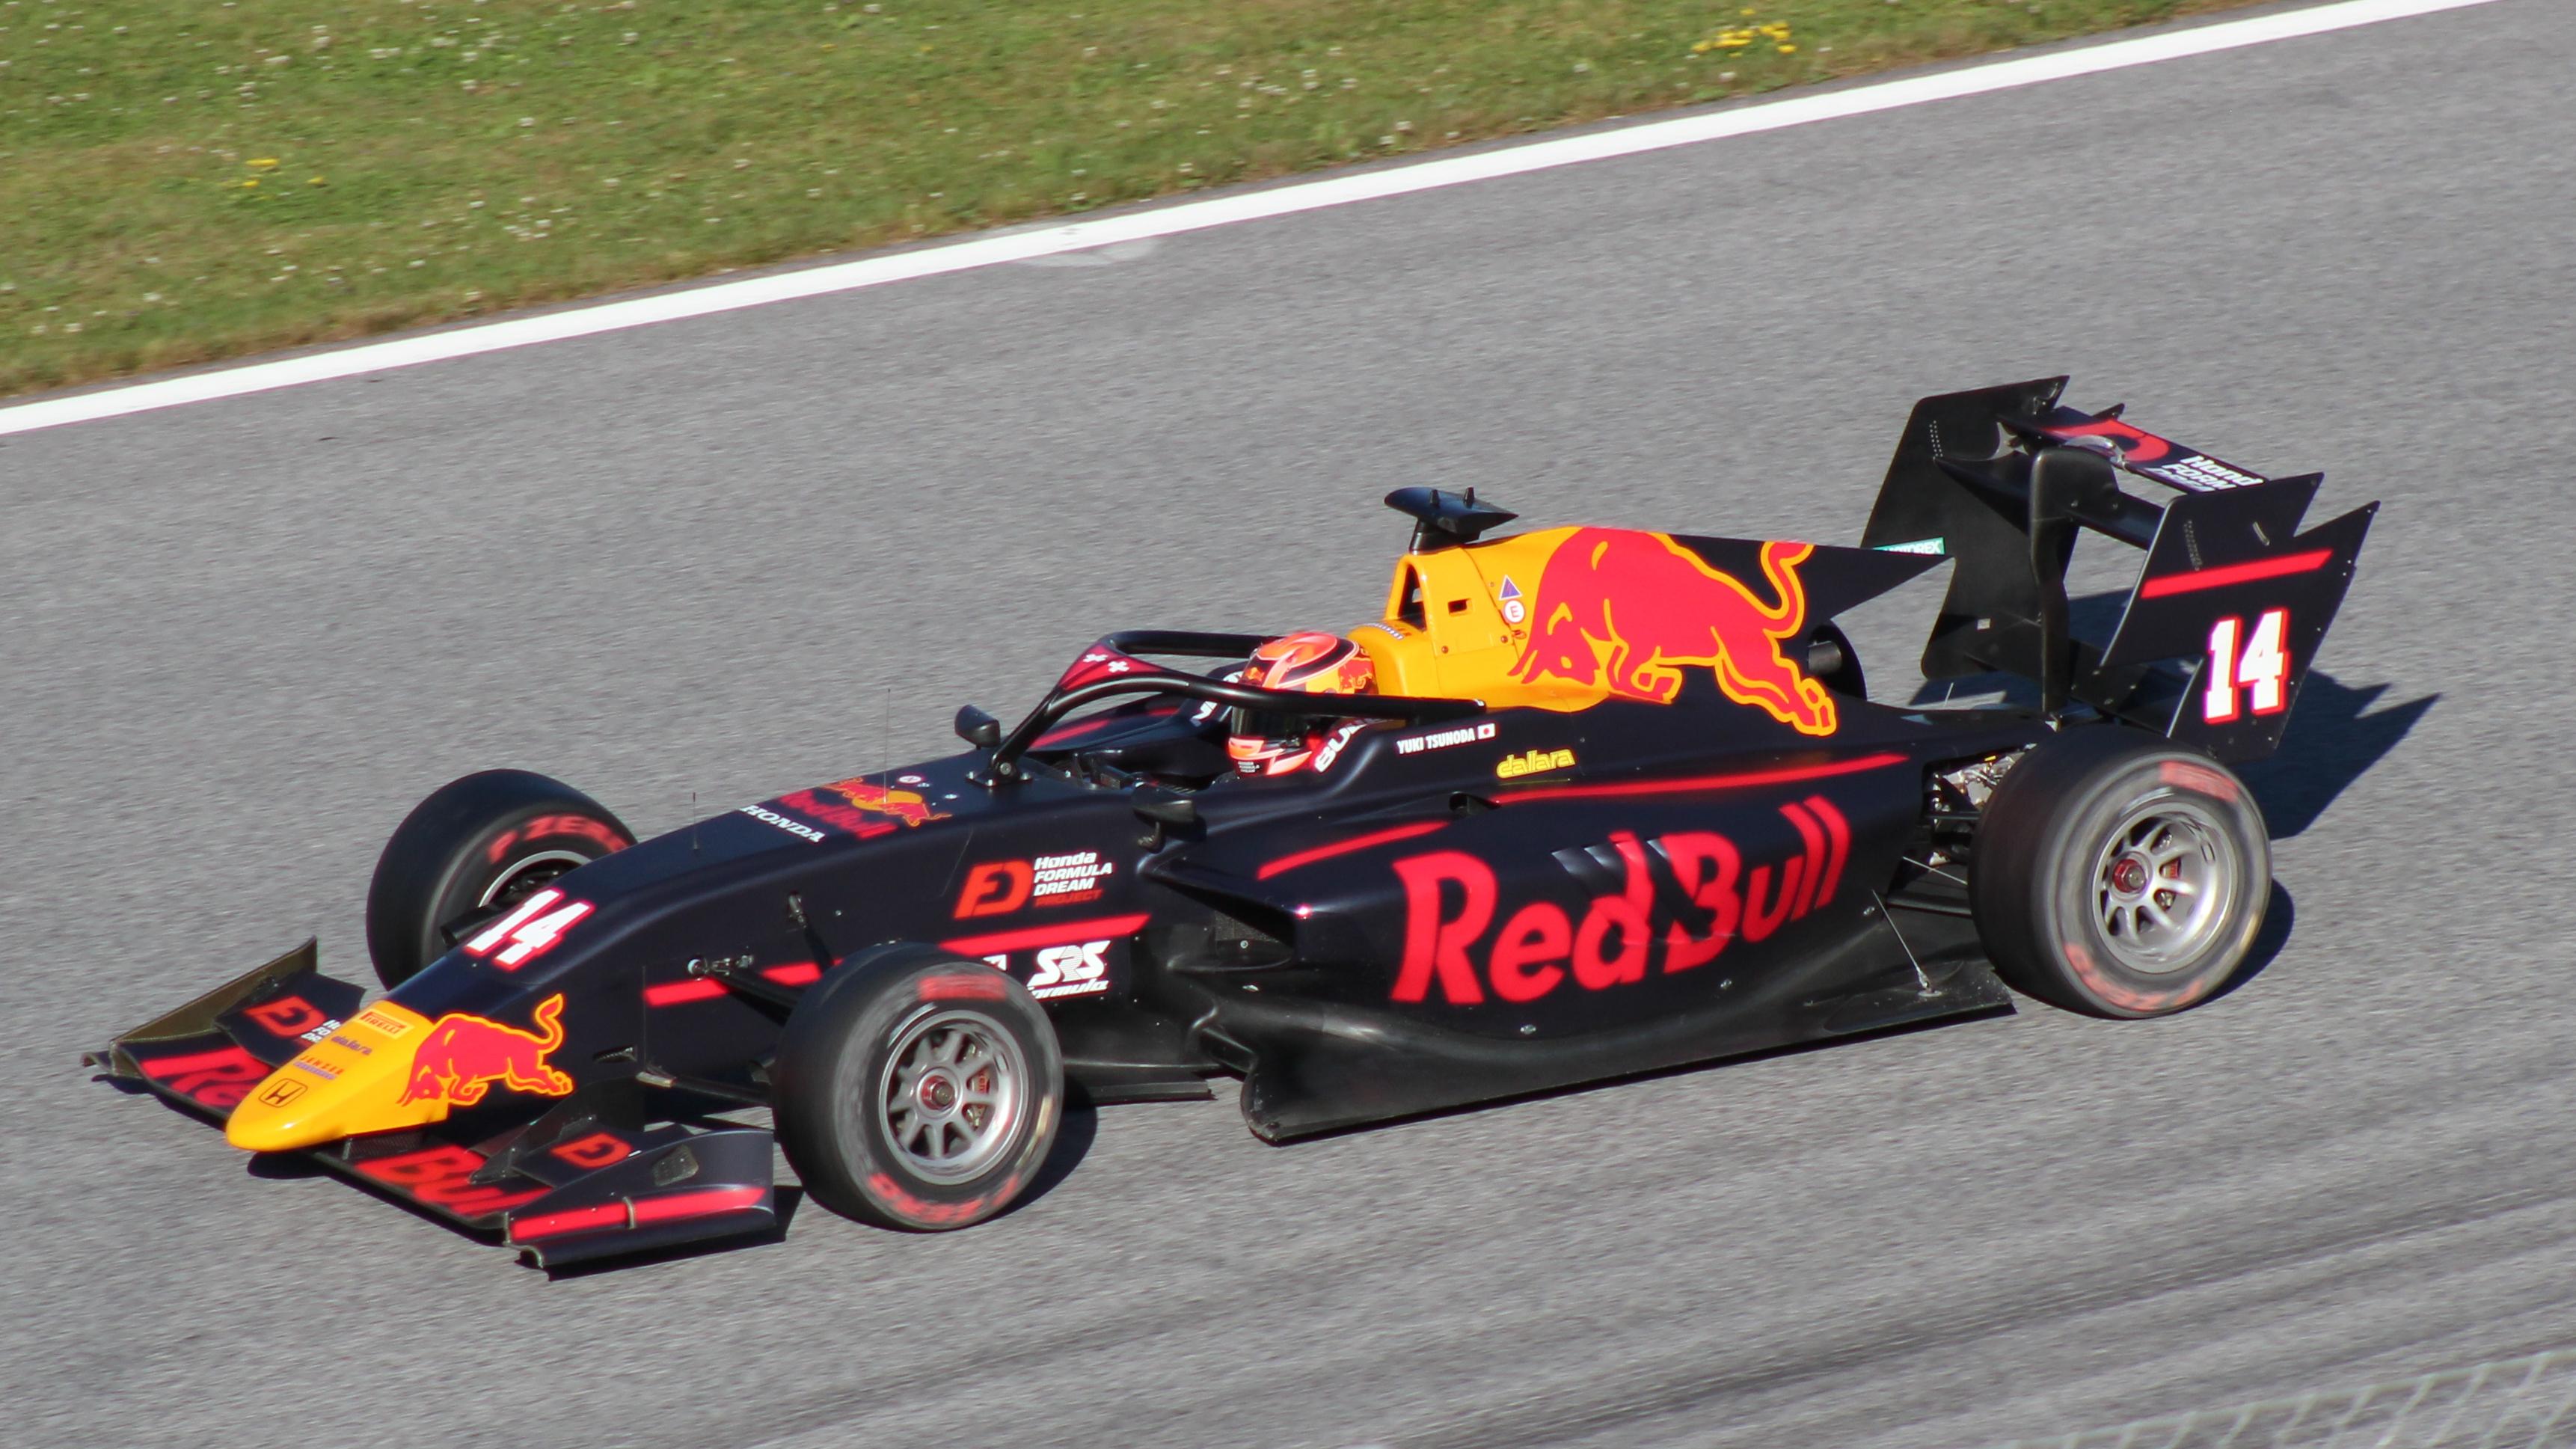 2021 F1's rookies odds